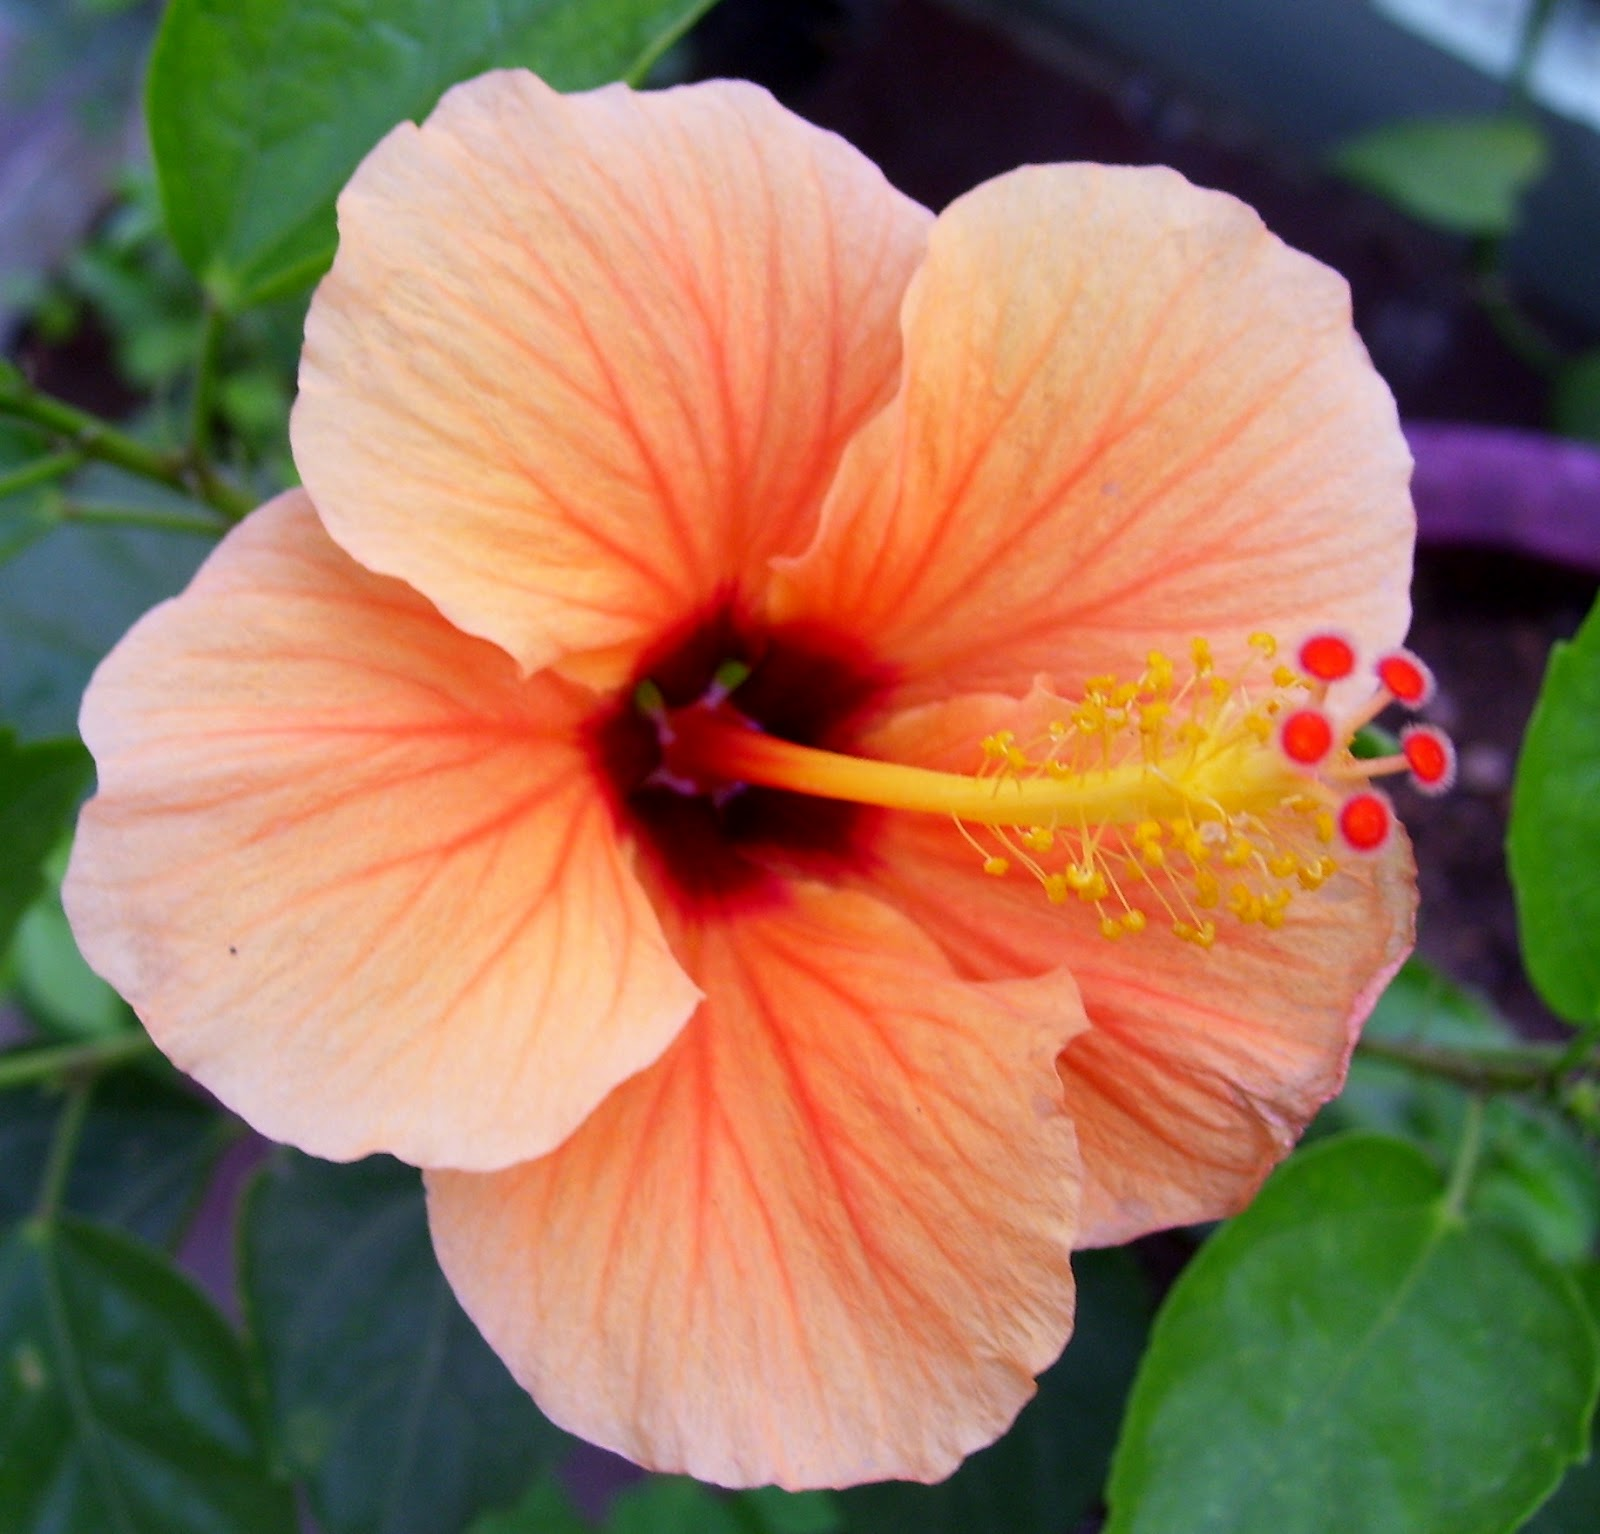 Hibiscus flower in tamil flower images 2018 flower images izmirmasajfo